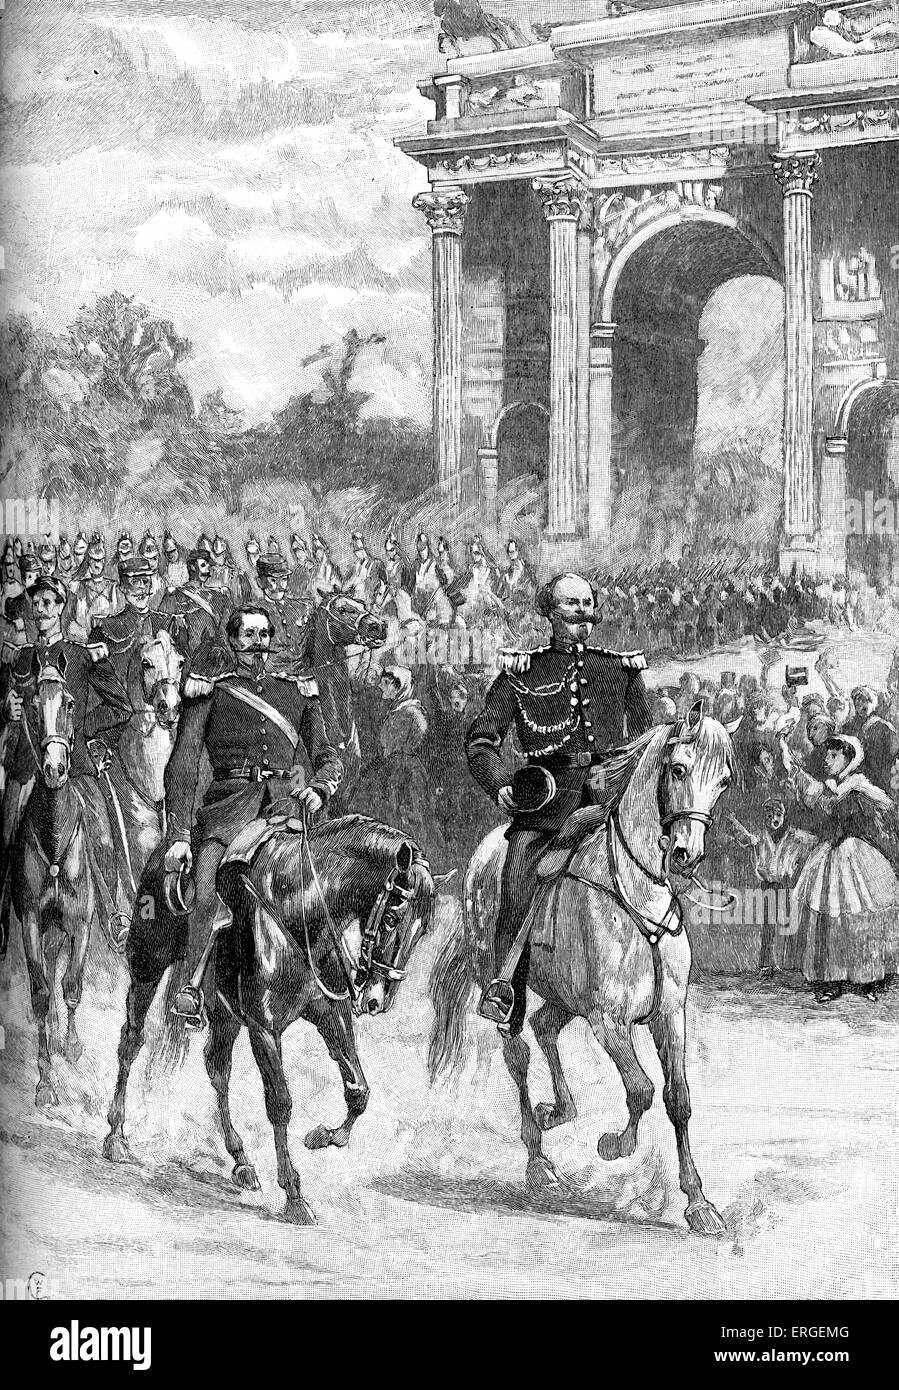 Napoleon III and King Victor-Emmanuel enter Milan, June 1859. Austrian defeat at the Battle of Magenta (4 June) - Stock Image